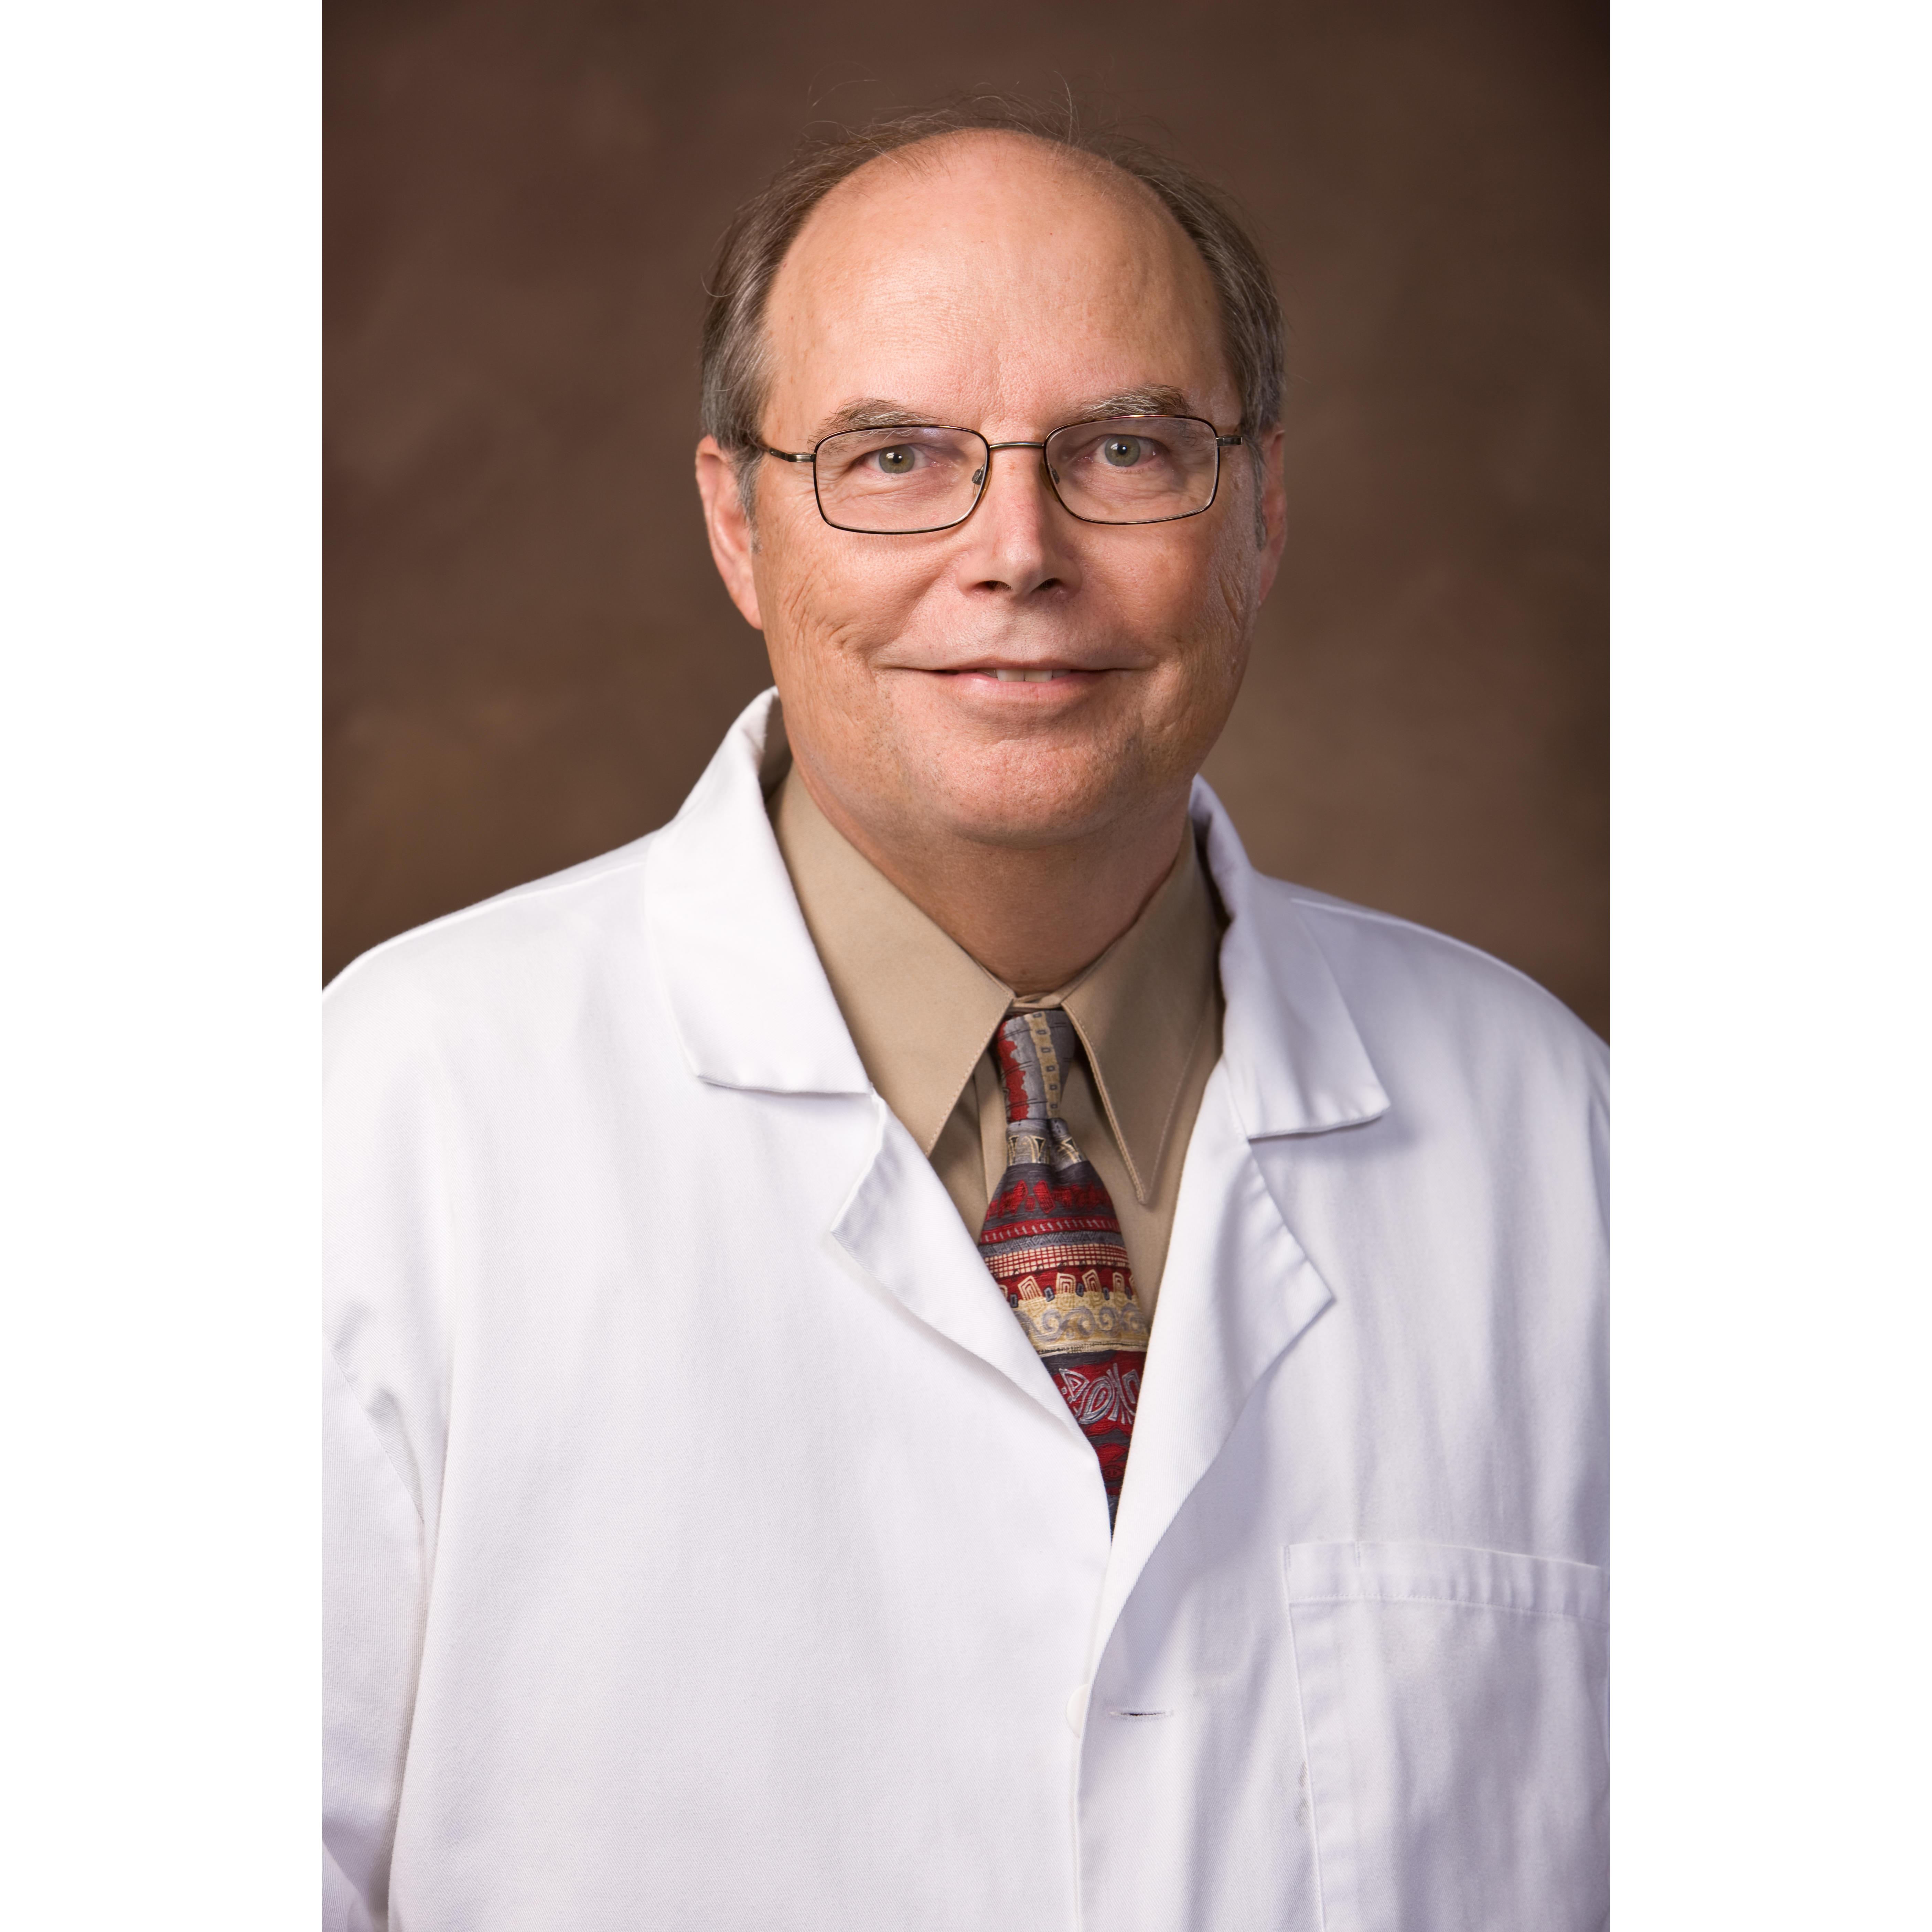 Michael Morris, MD